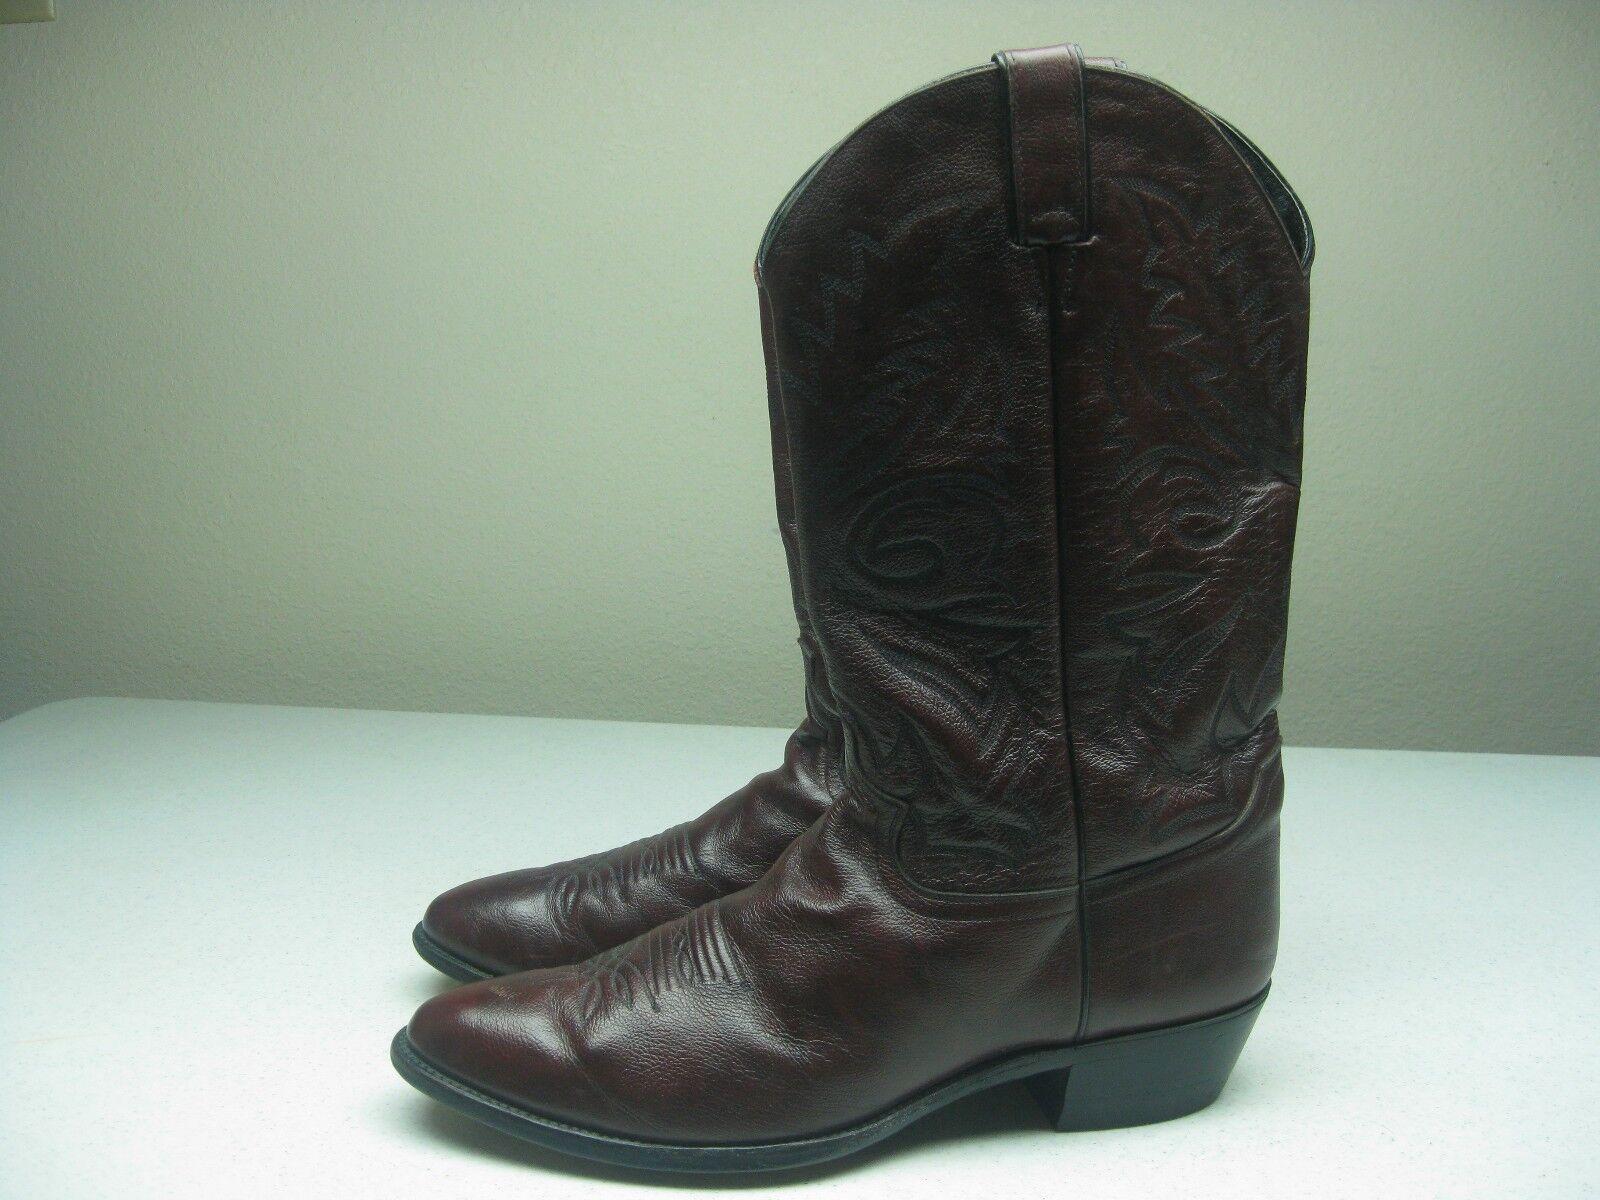 Vintage Justin Borgoña occidental botas de vaquero Tamaño 13 D